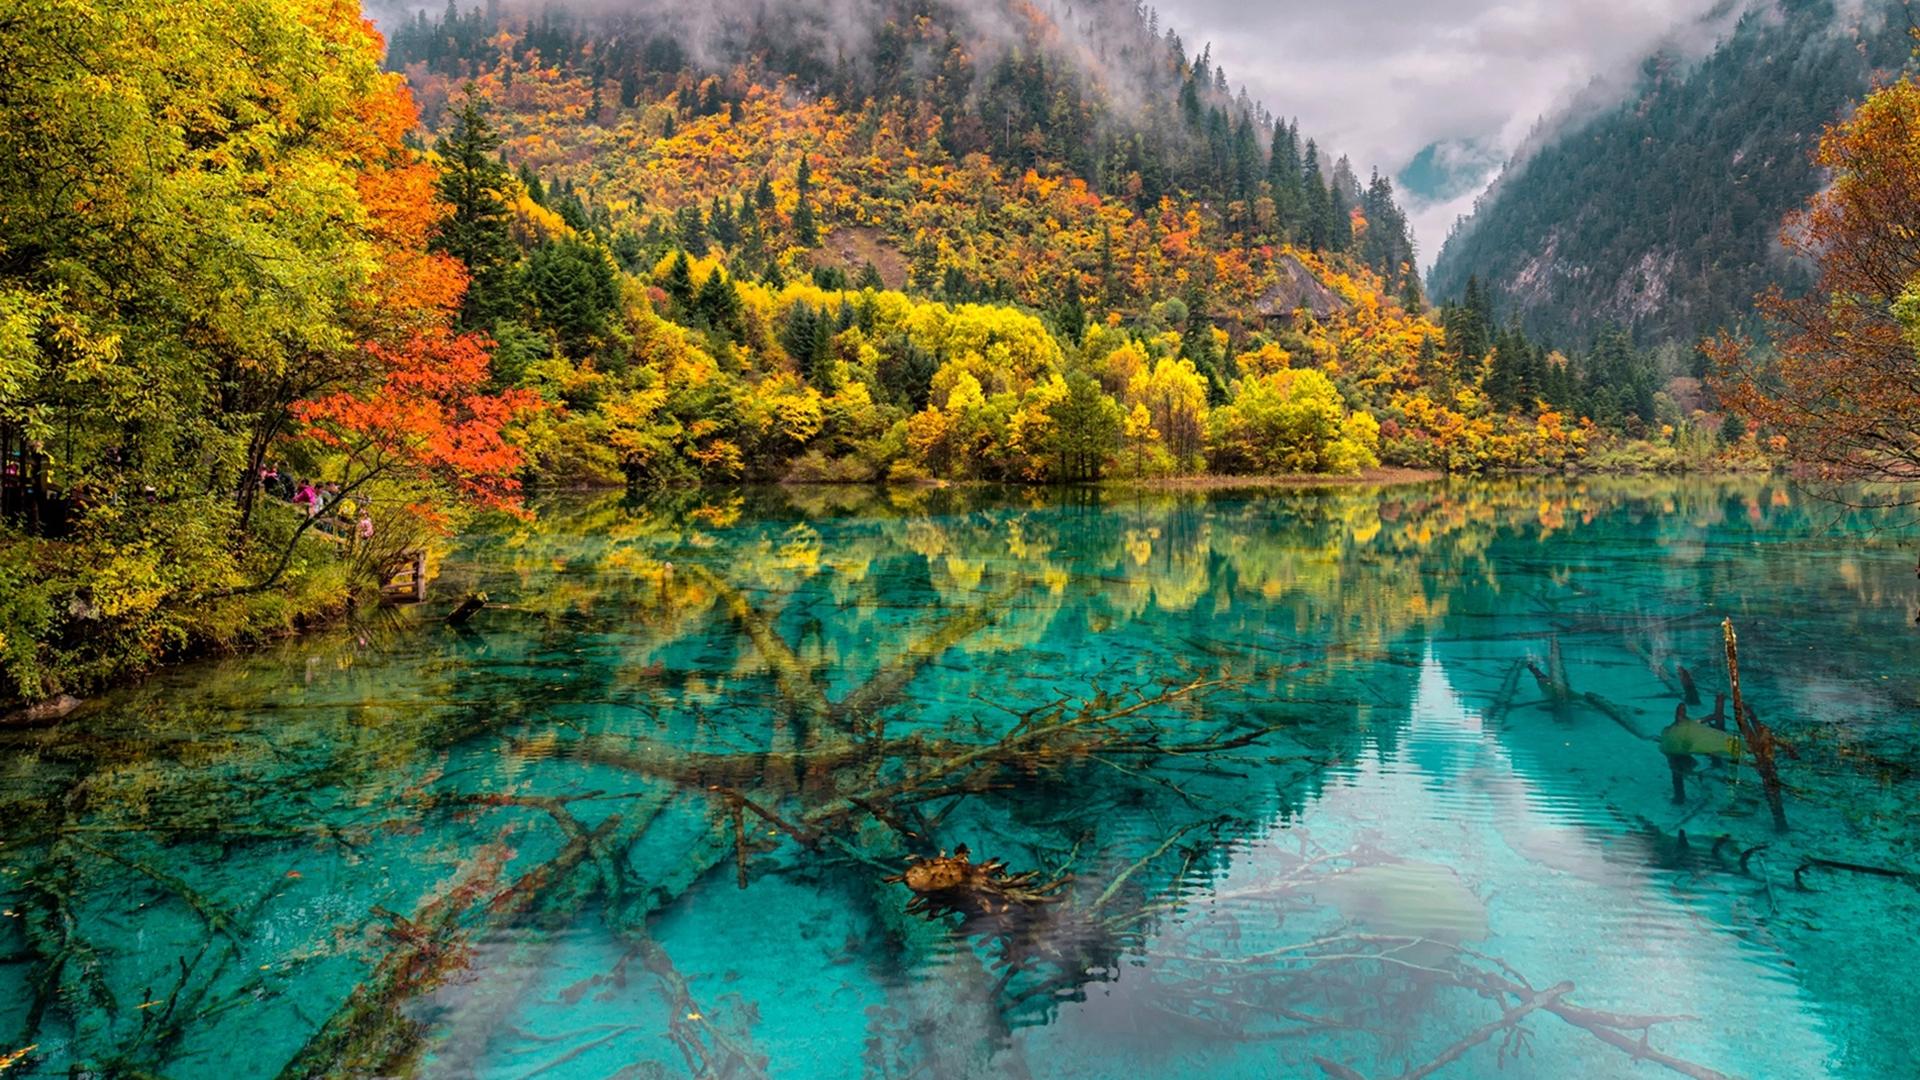 Kinh nghiệm du lịch Cửu Trại Câu | Mùa thu